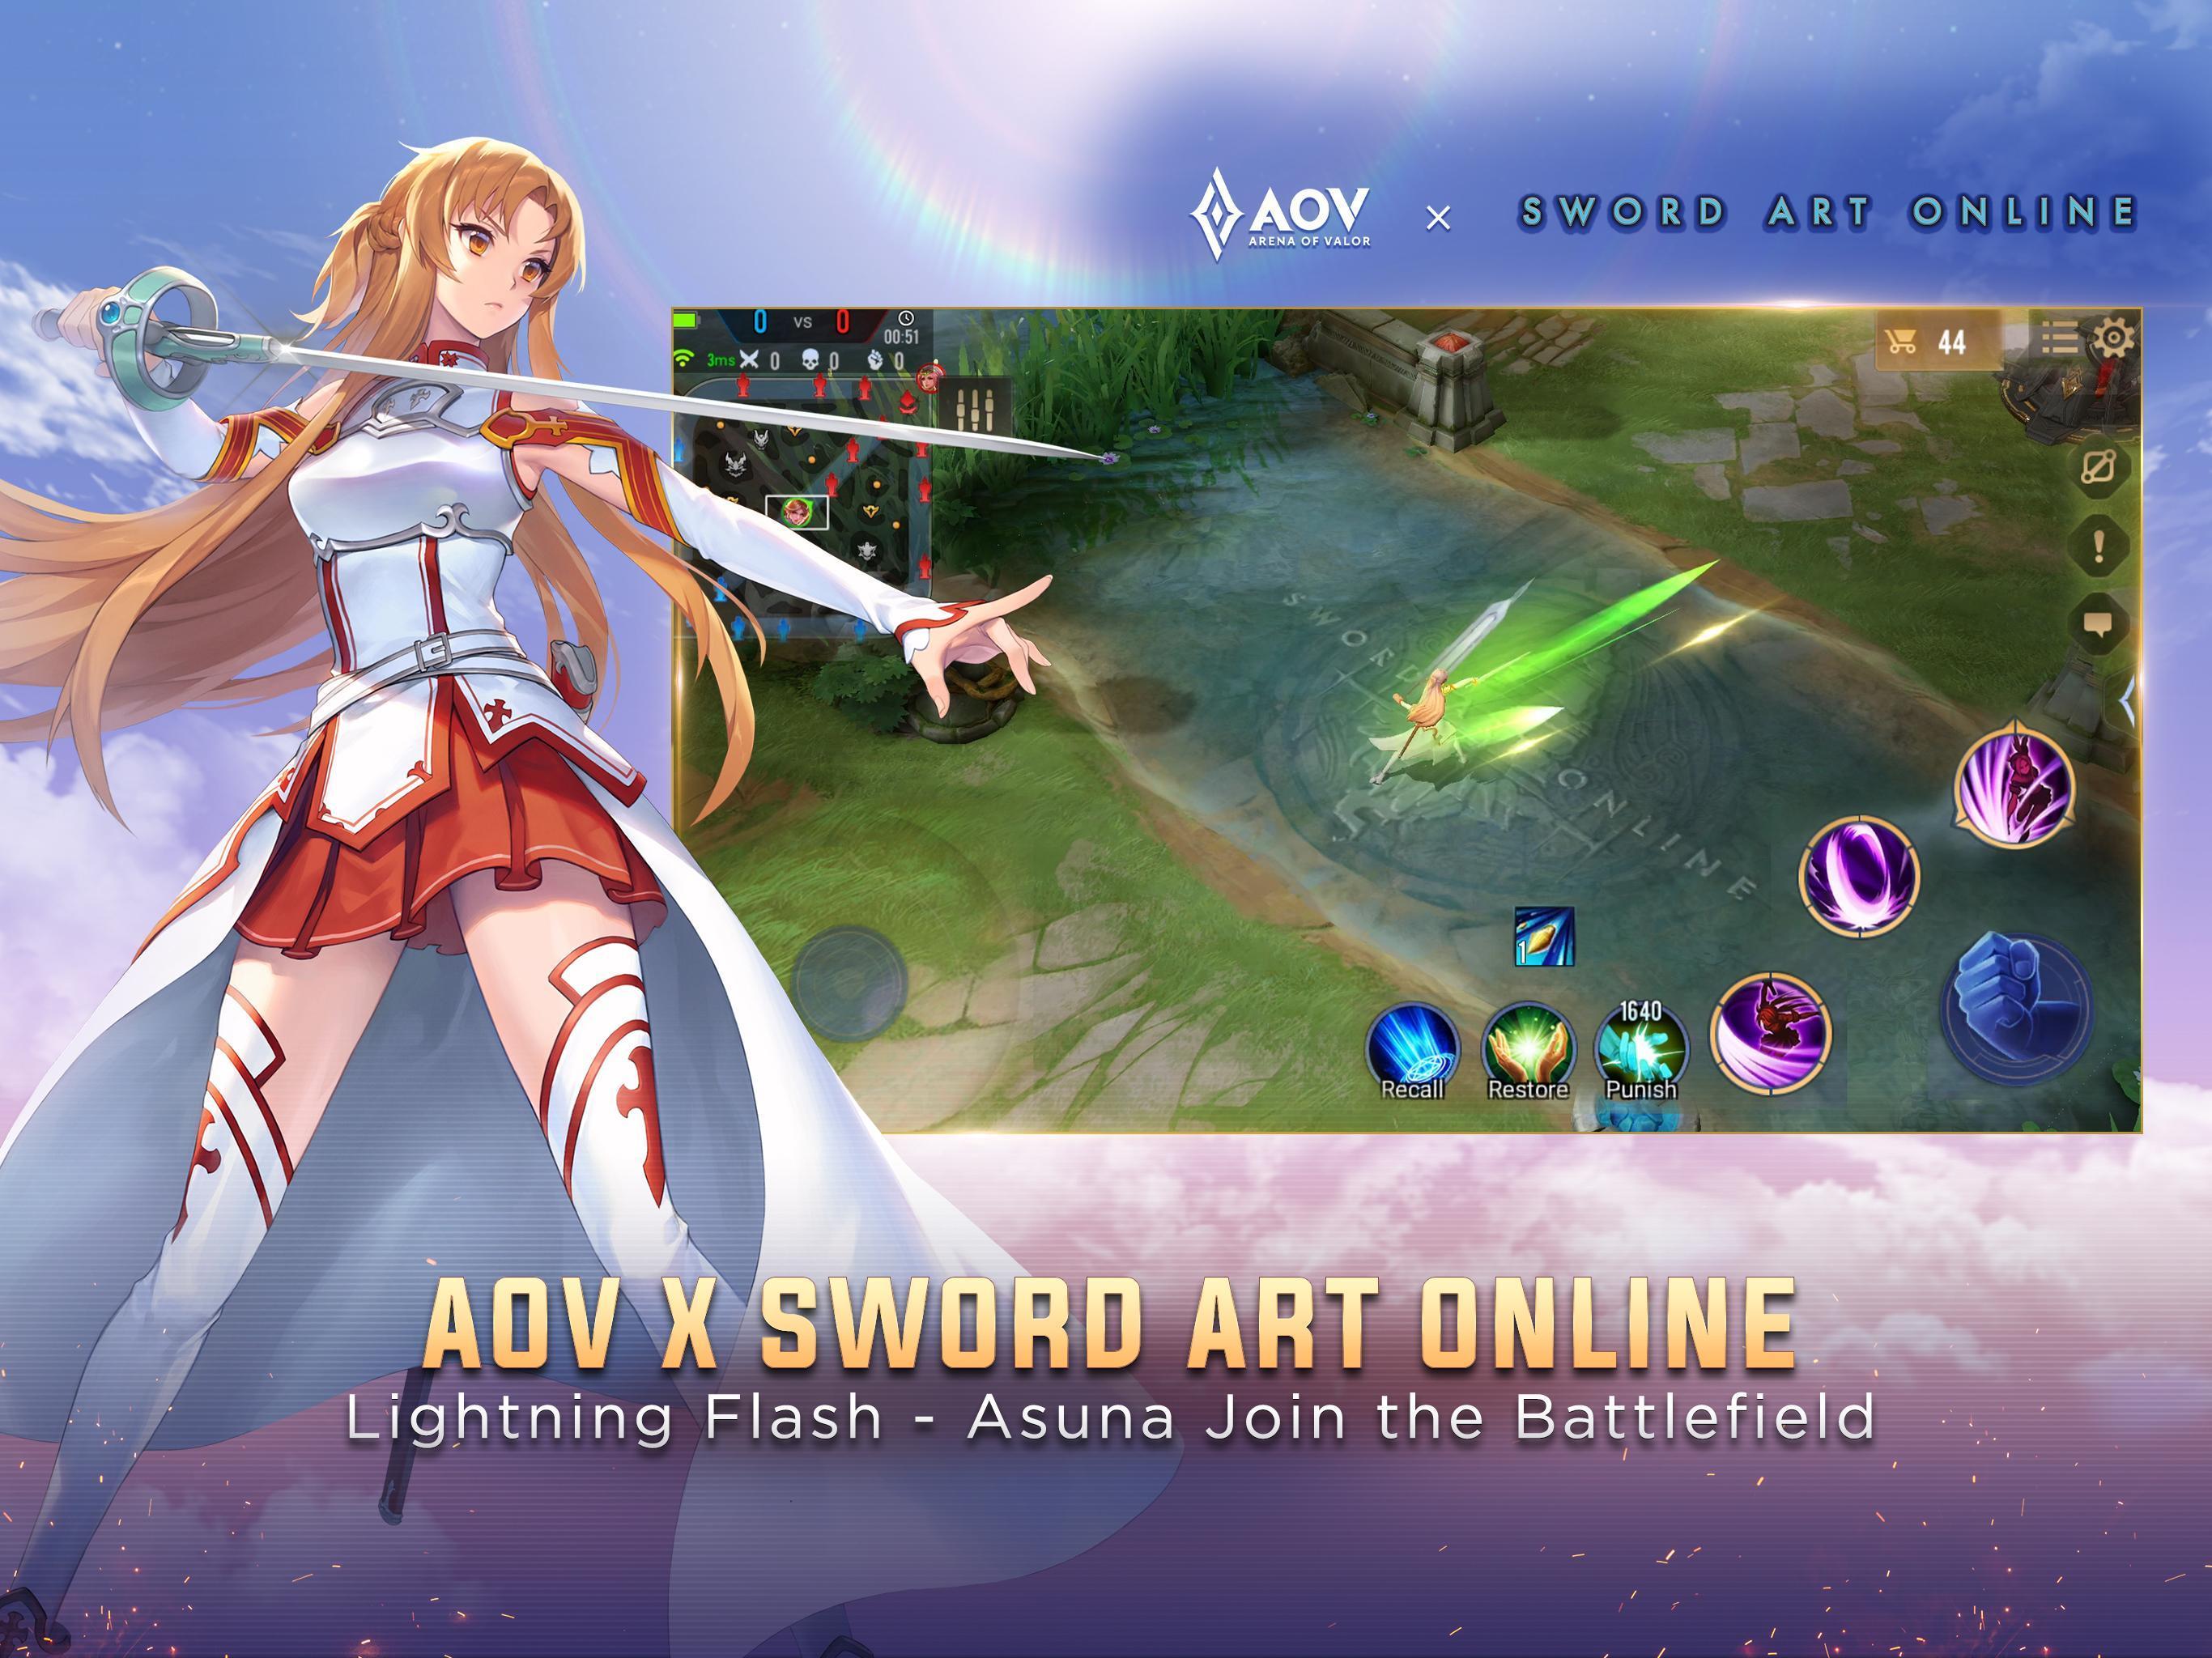 Garena AOV - Arena of Valor: Action MOBA 1.36.1.5 Screenshot 11